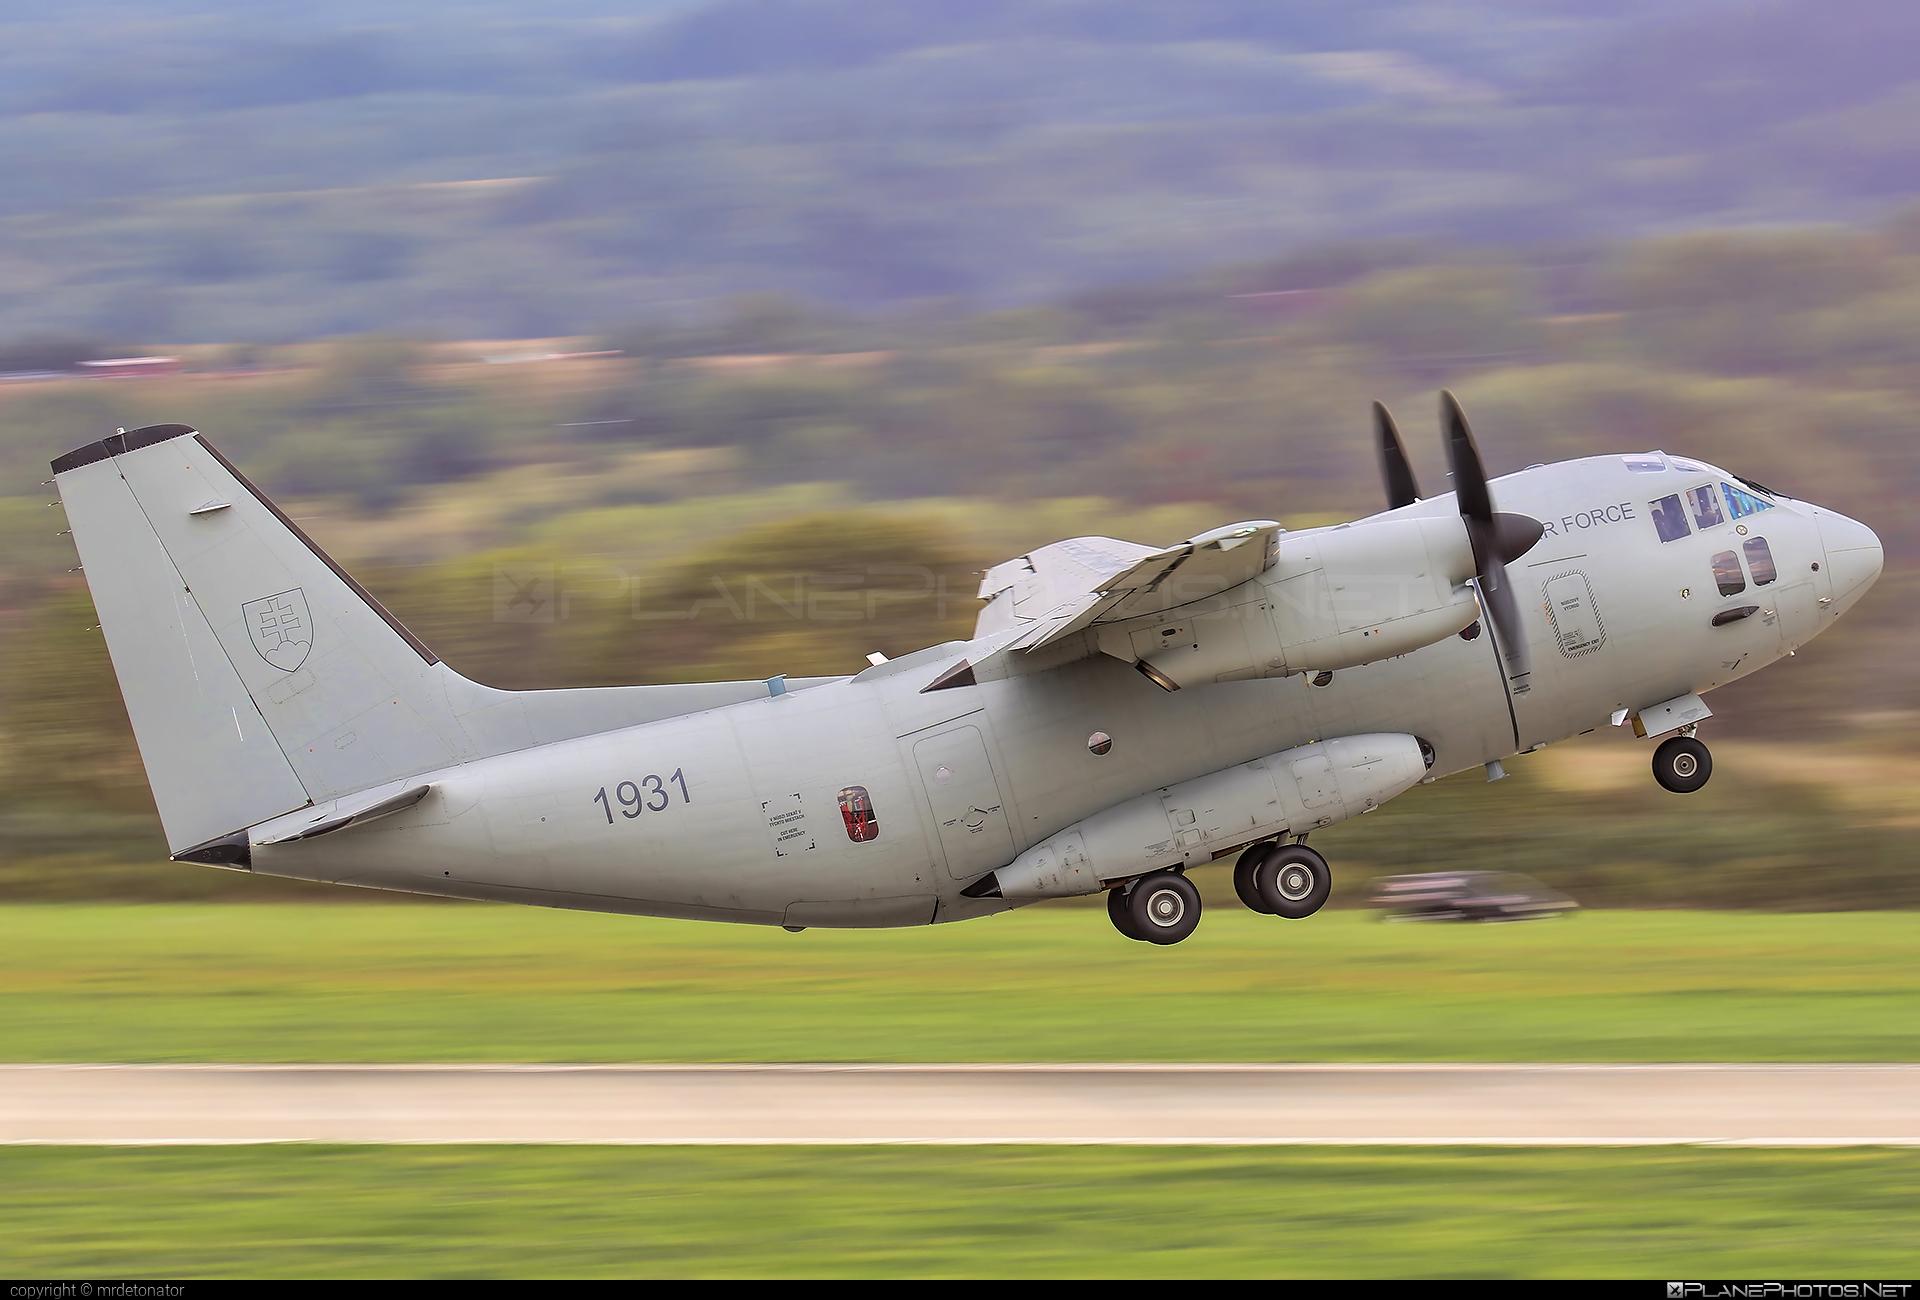 Leonardo C-27J Spartan - 1931 operated by Vzdušné sily OS SR (Slovak Air Force) #c27j #c27jspartan #c27spartan #leonardo #leonardo27j #leonardoc27jspartan #leonardospartan #siaf2018 #slovakairforce #vzdusnesilyossr